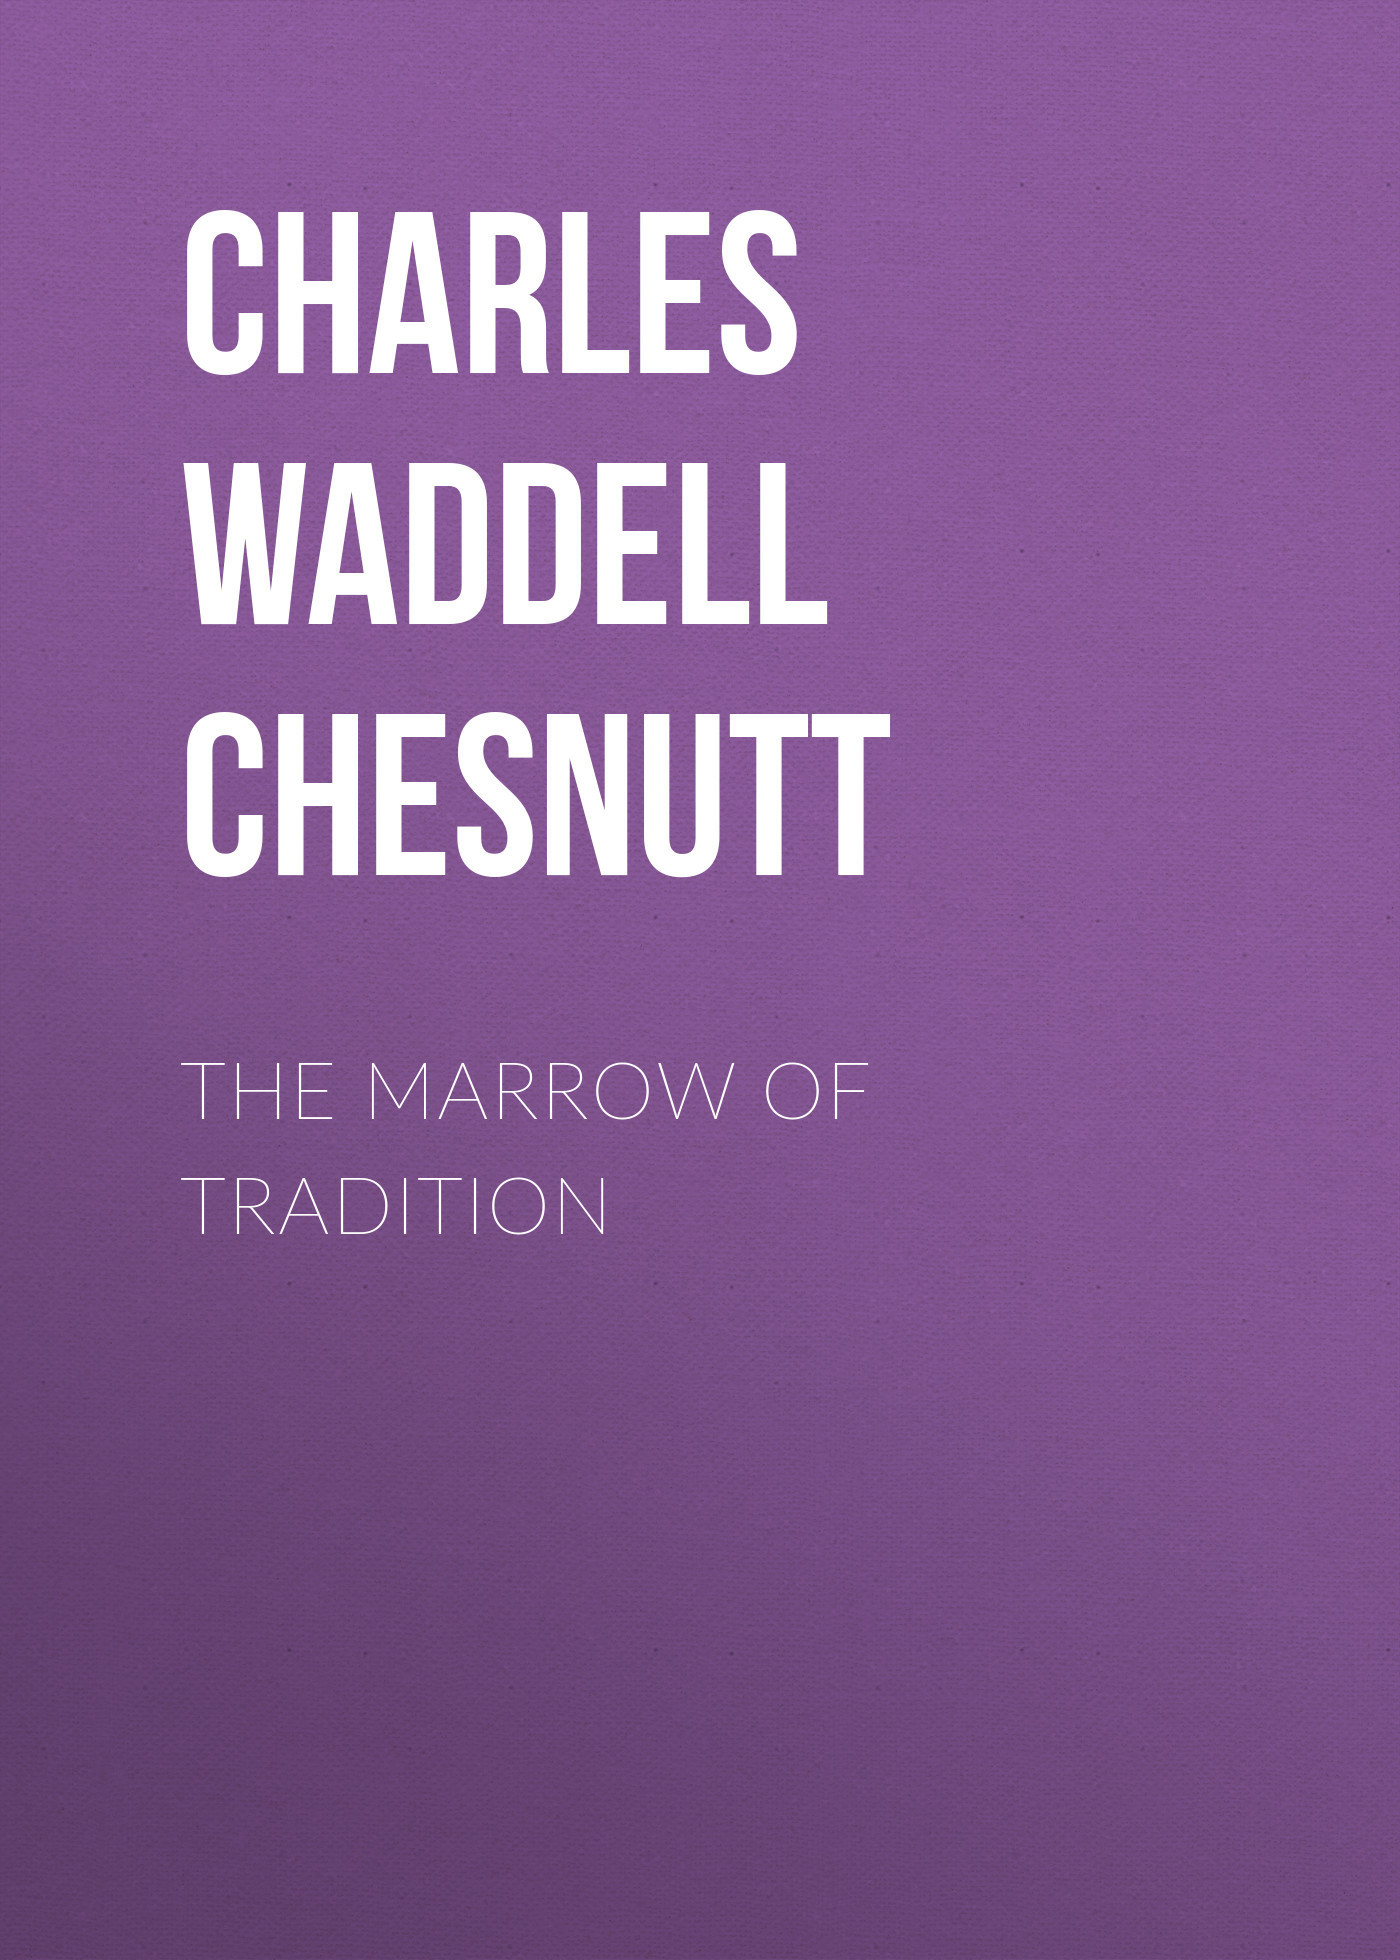 Charles Waddell Chesnutt The Marrow of Tradition charles perrault kuldjuustega kaunitar